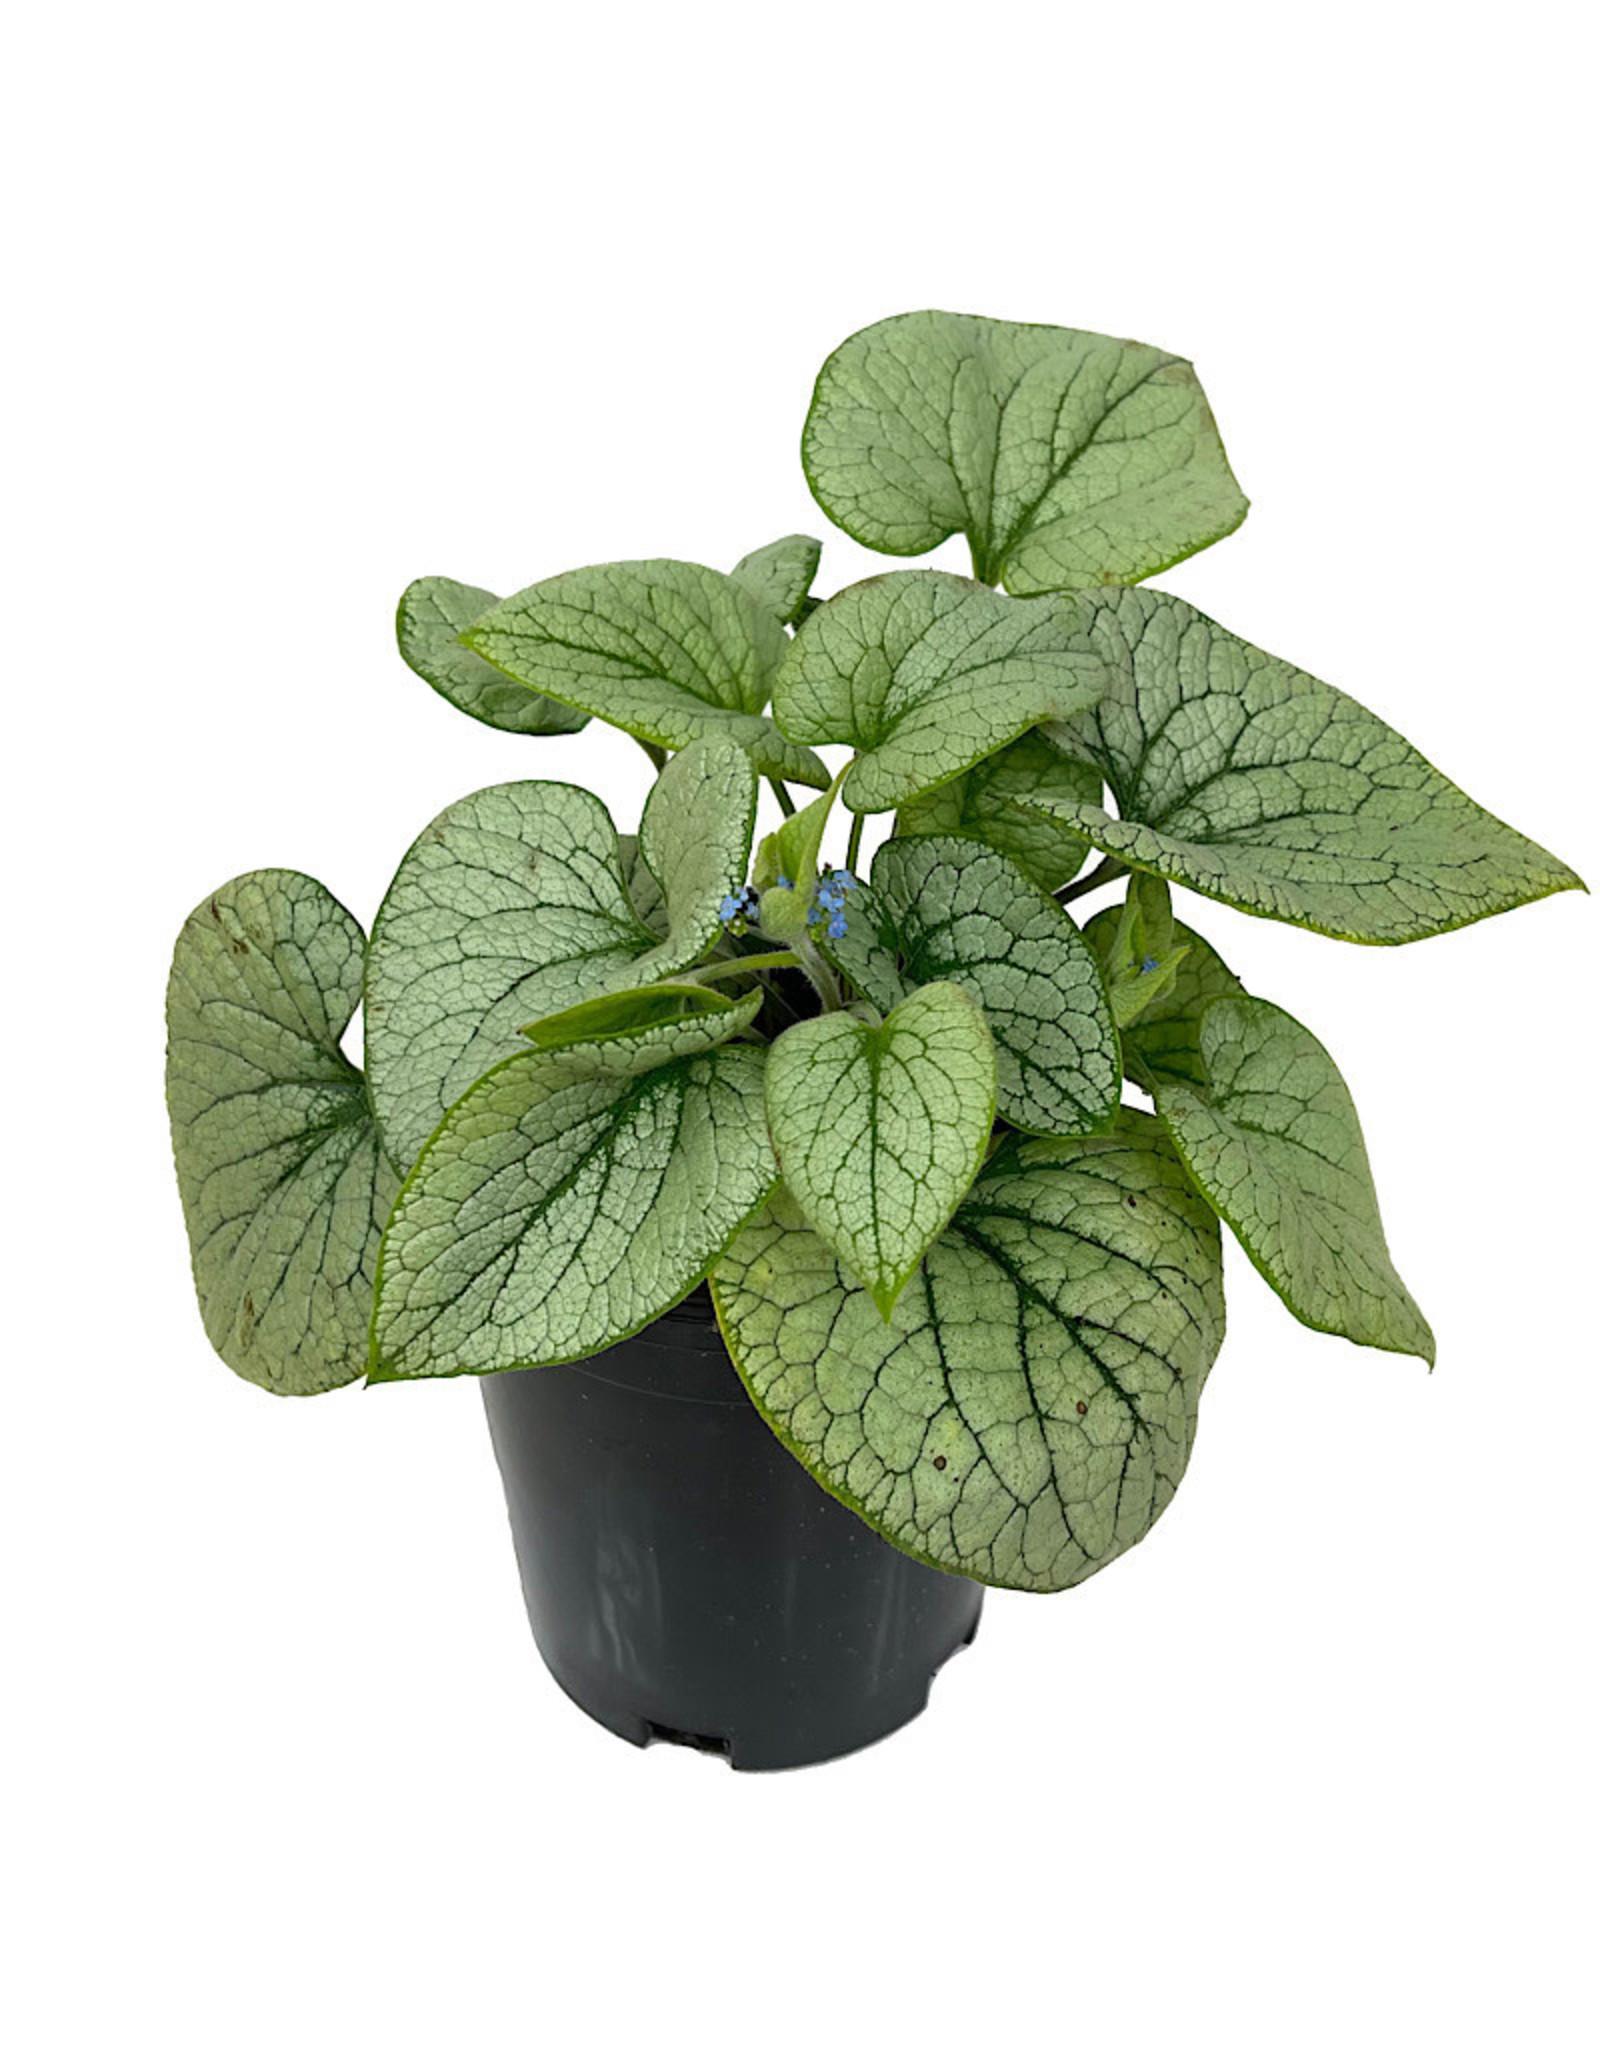 Brunnera macrophylla 'Alchemy Silver' 1 Gallon